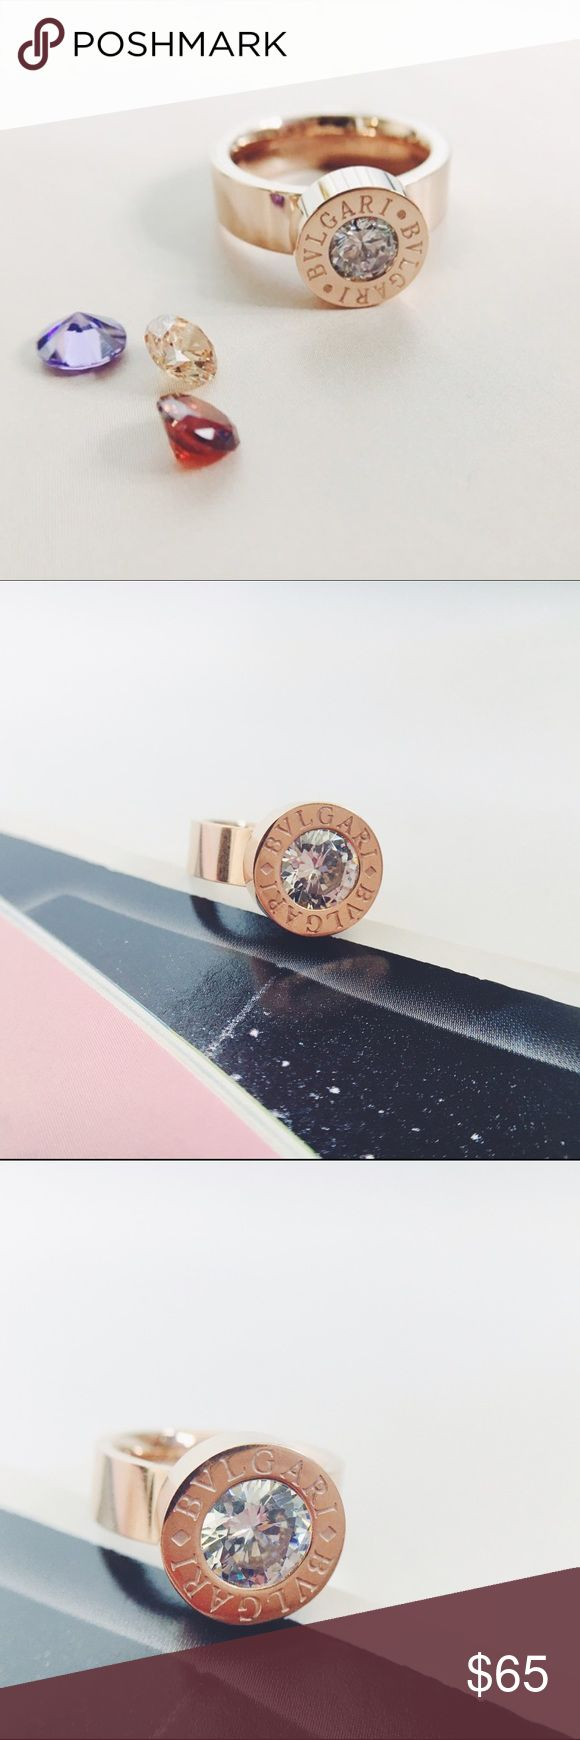 bulgari rose gold ring with cz stones bvlgari gorgeous rose gold fashion bvlgari ring with